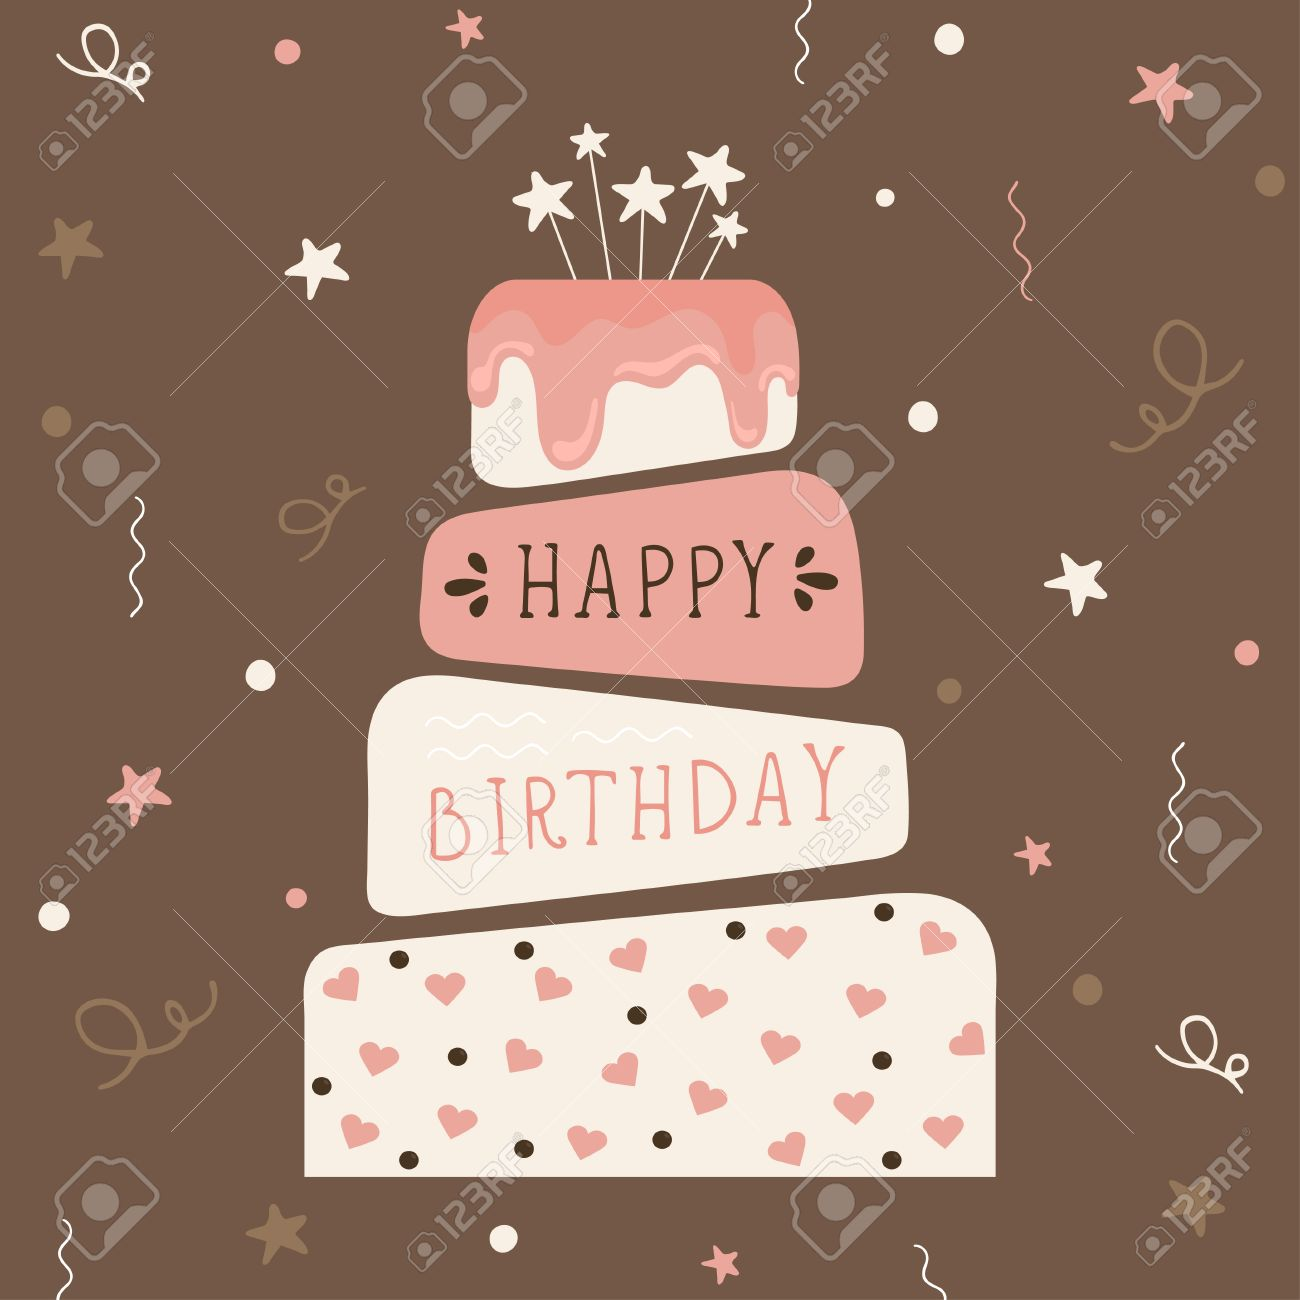 Cute Happy Birthday Card With Cake Birthday Cake Vector